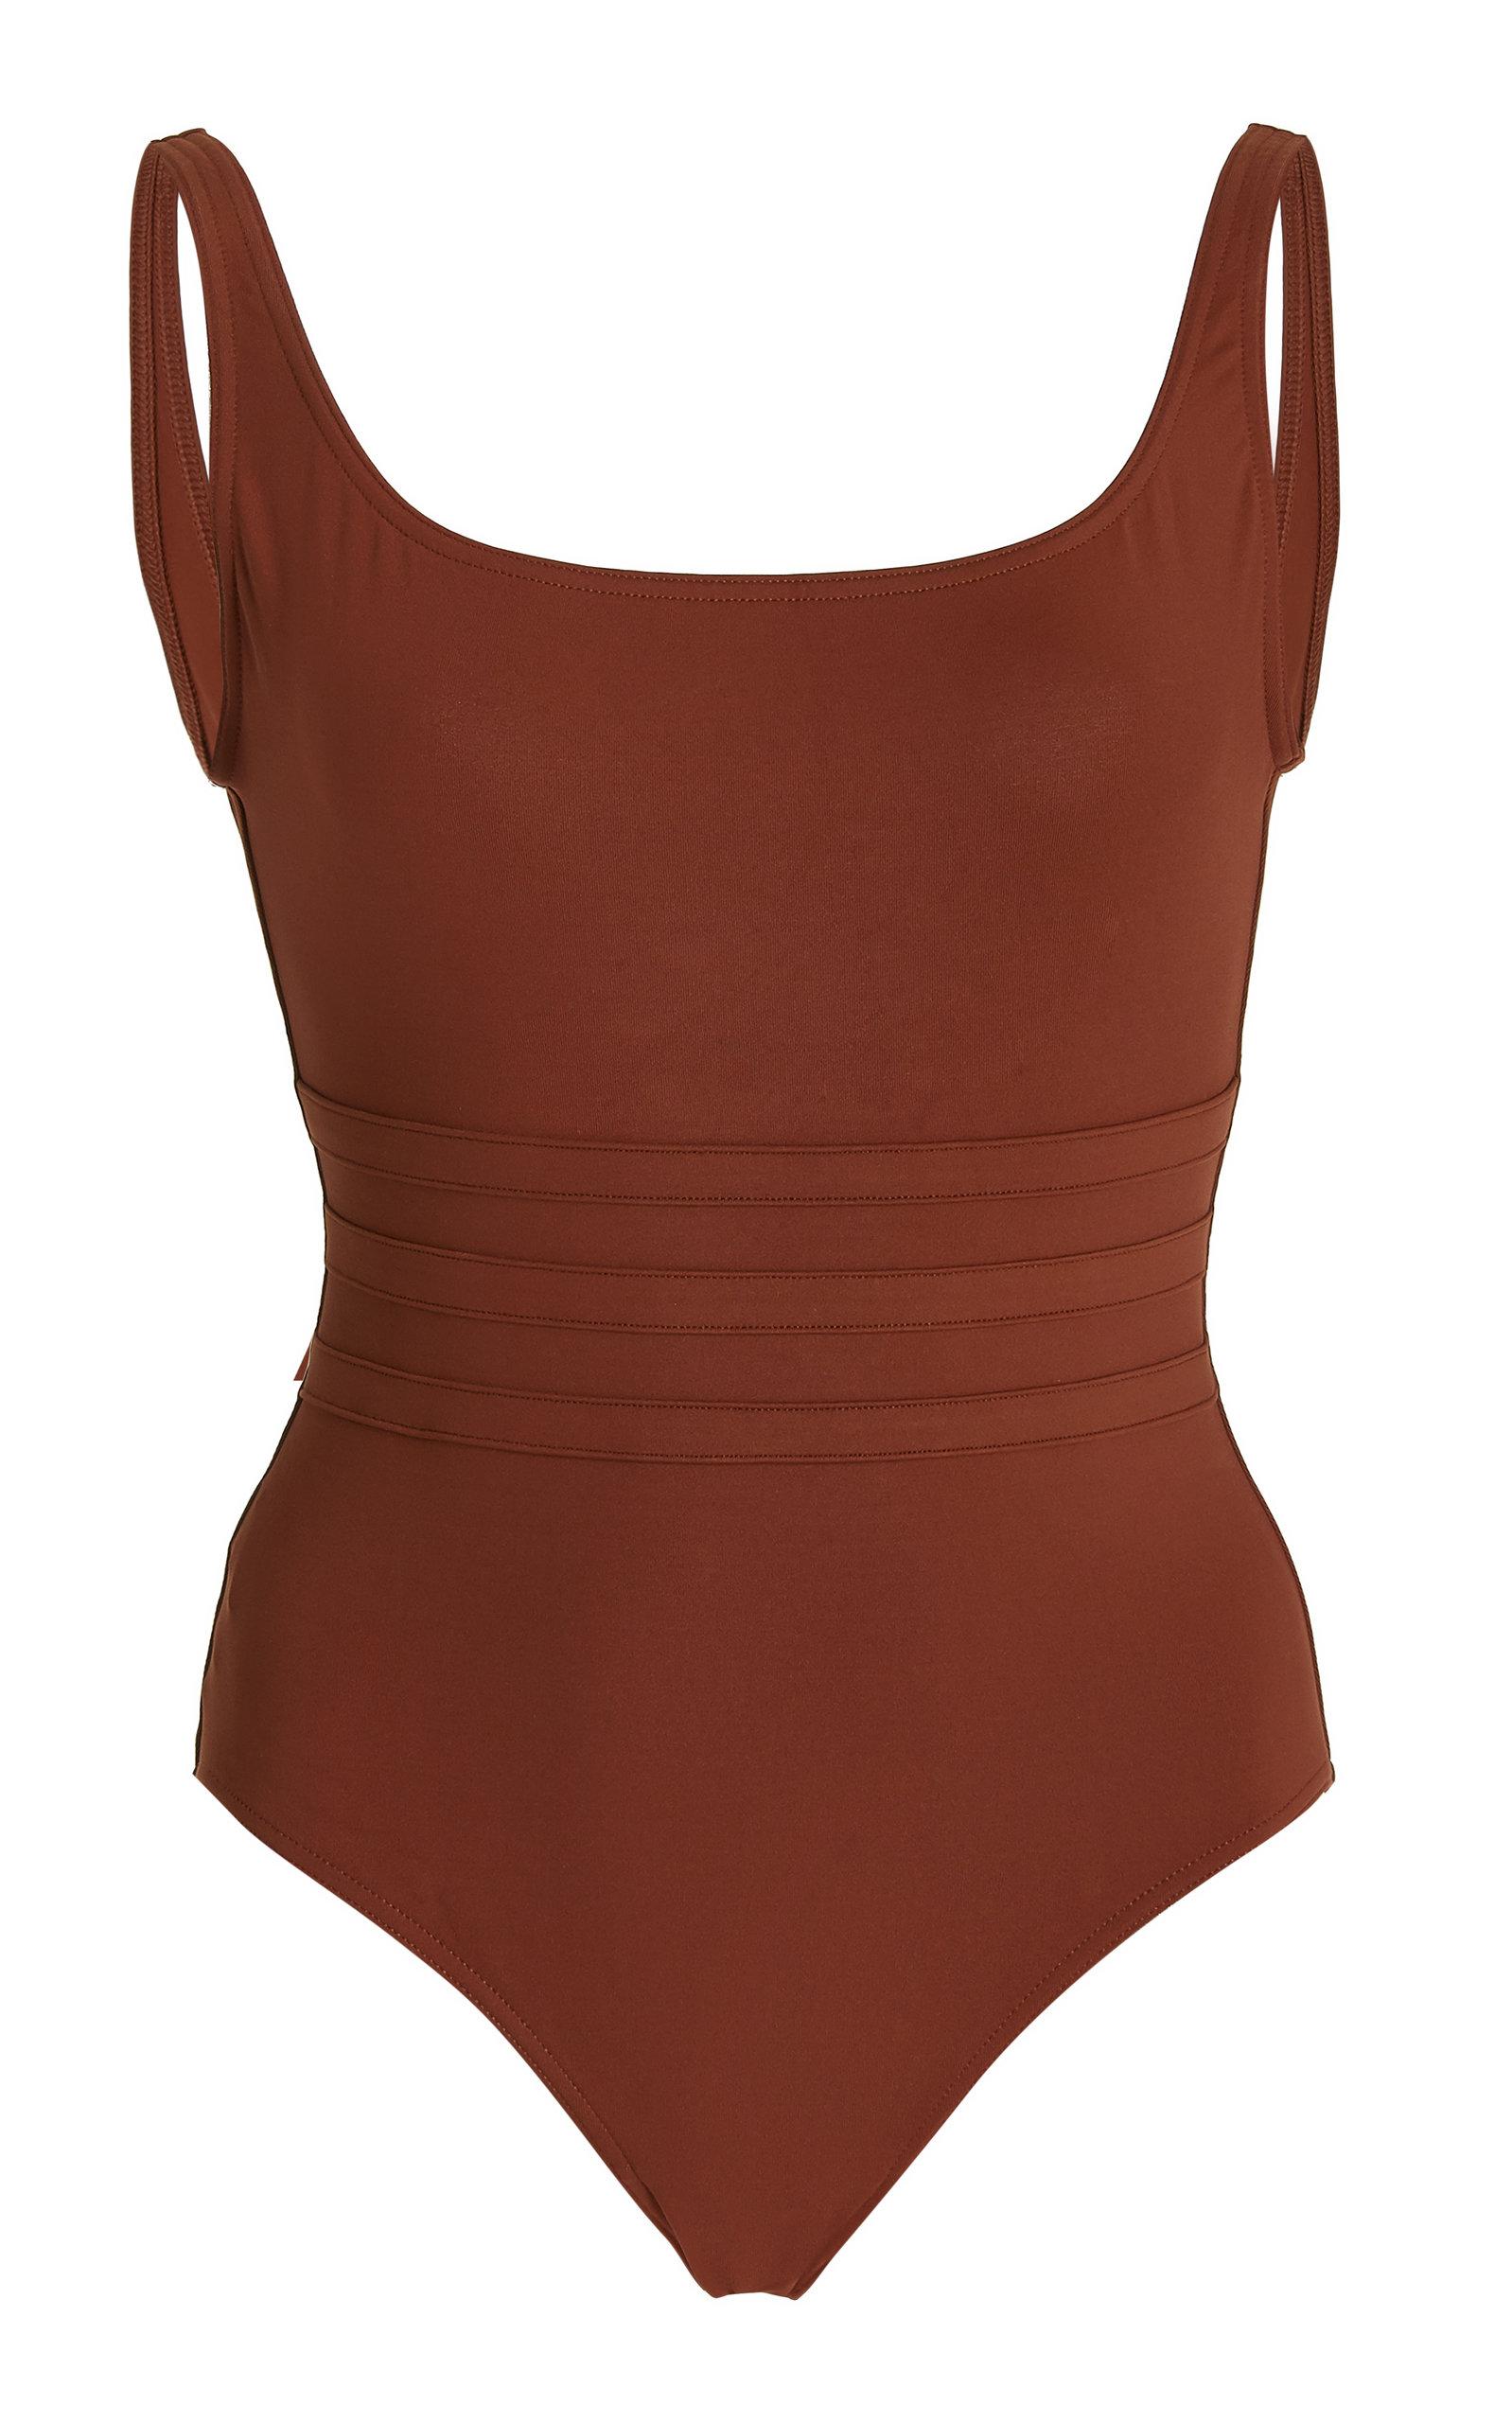 Eres – Women's Asia One-Piece Swimsuit – Brown – Moda Operandi